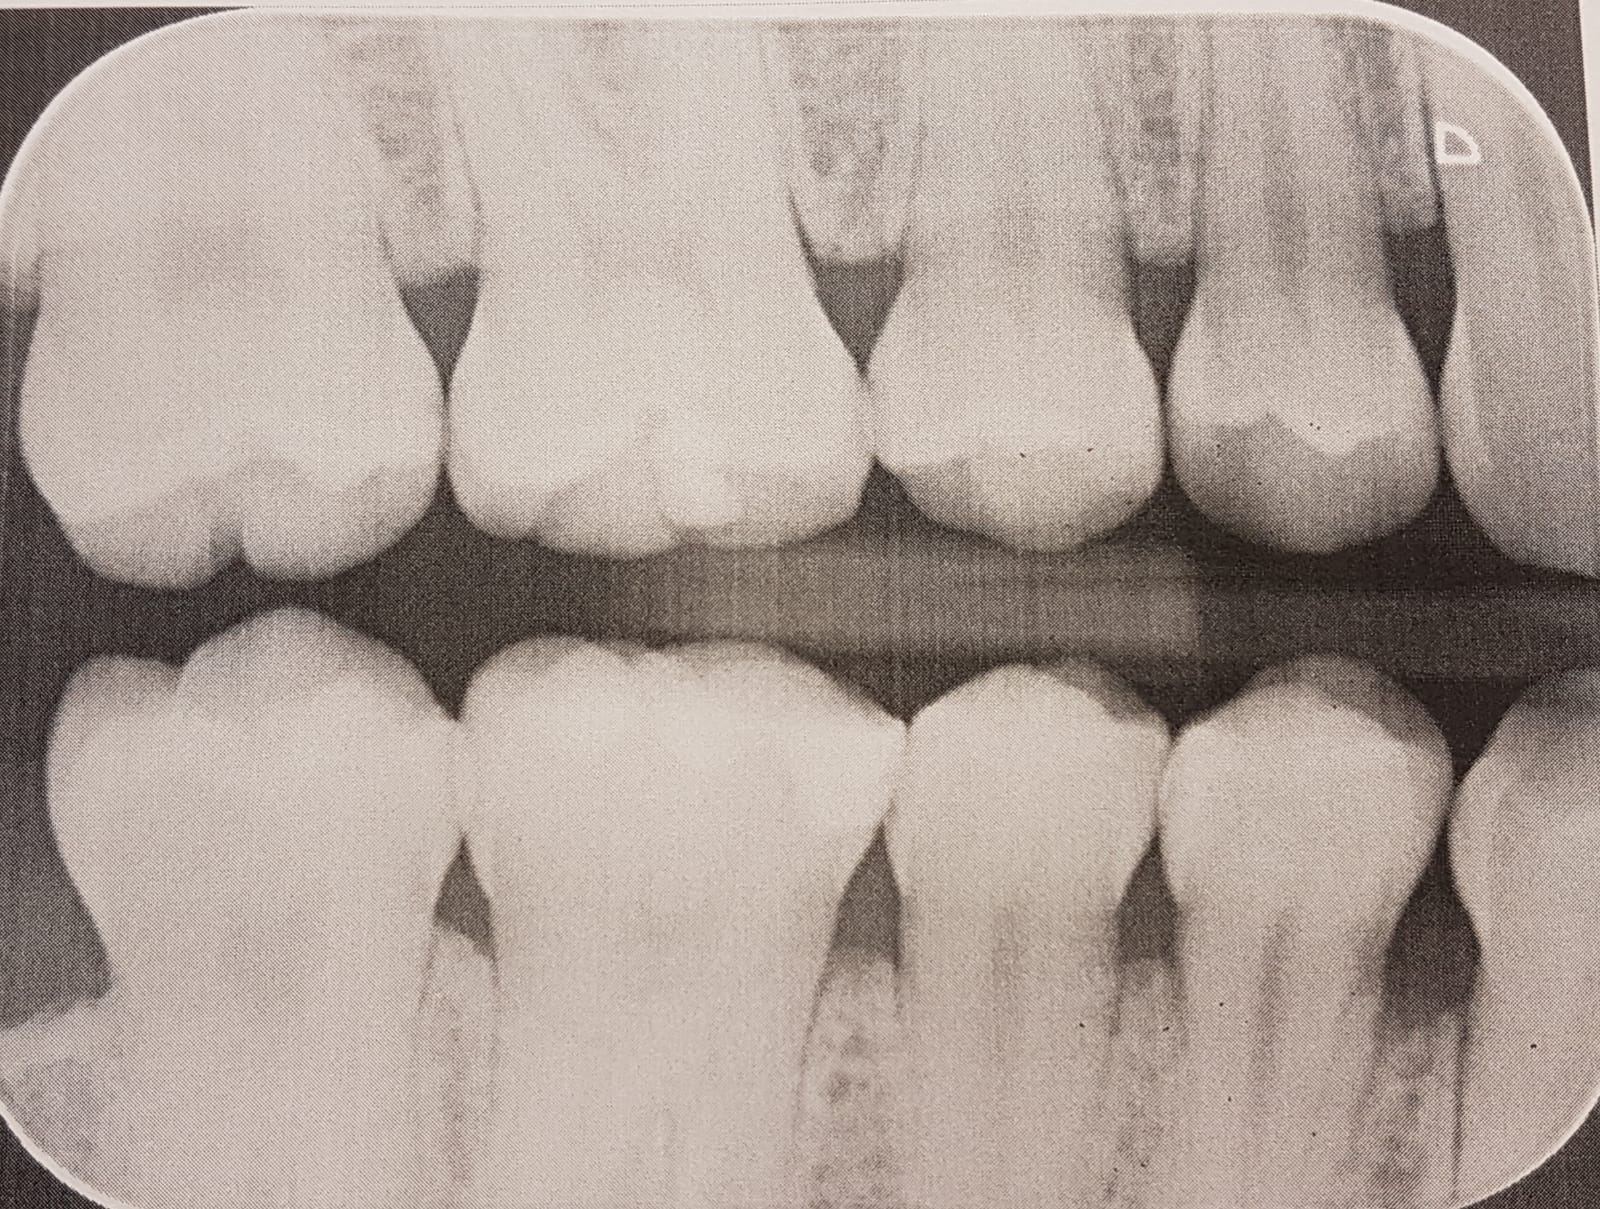 Zahnarztpraxis Sylvia Pahl Digitales Röntgen